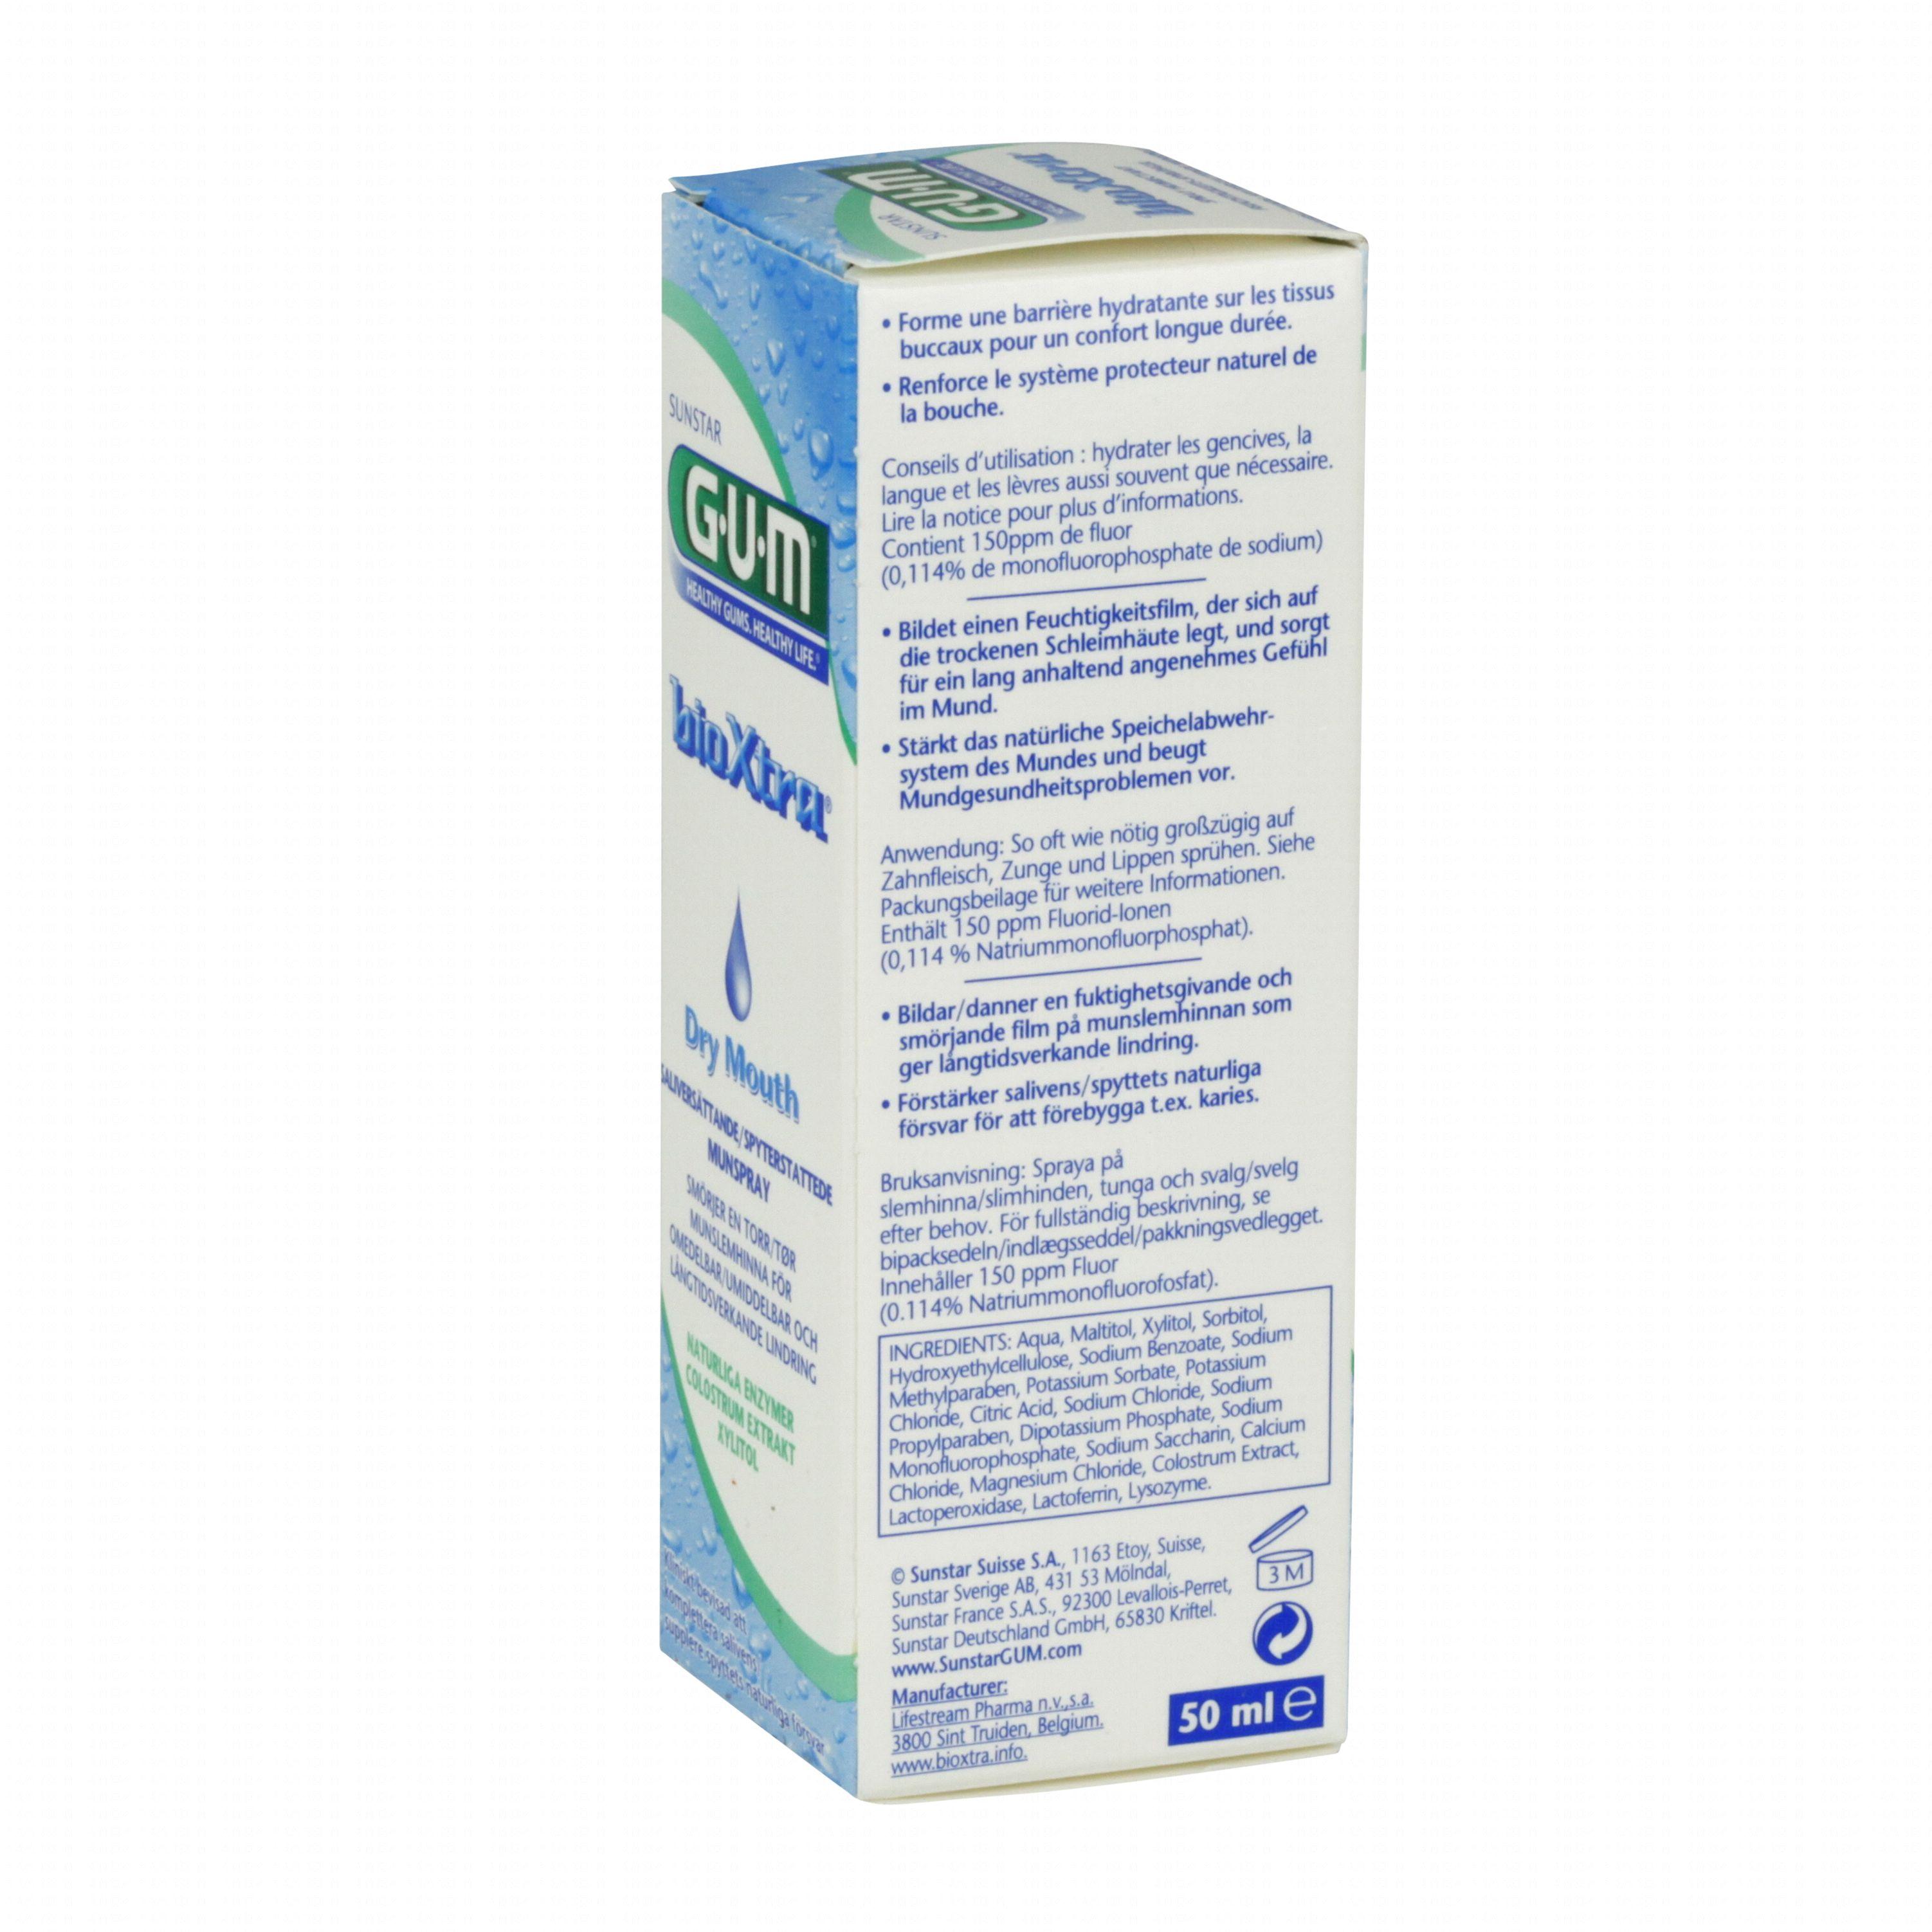 Spray hydratant pour la bouche